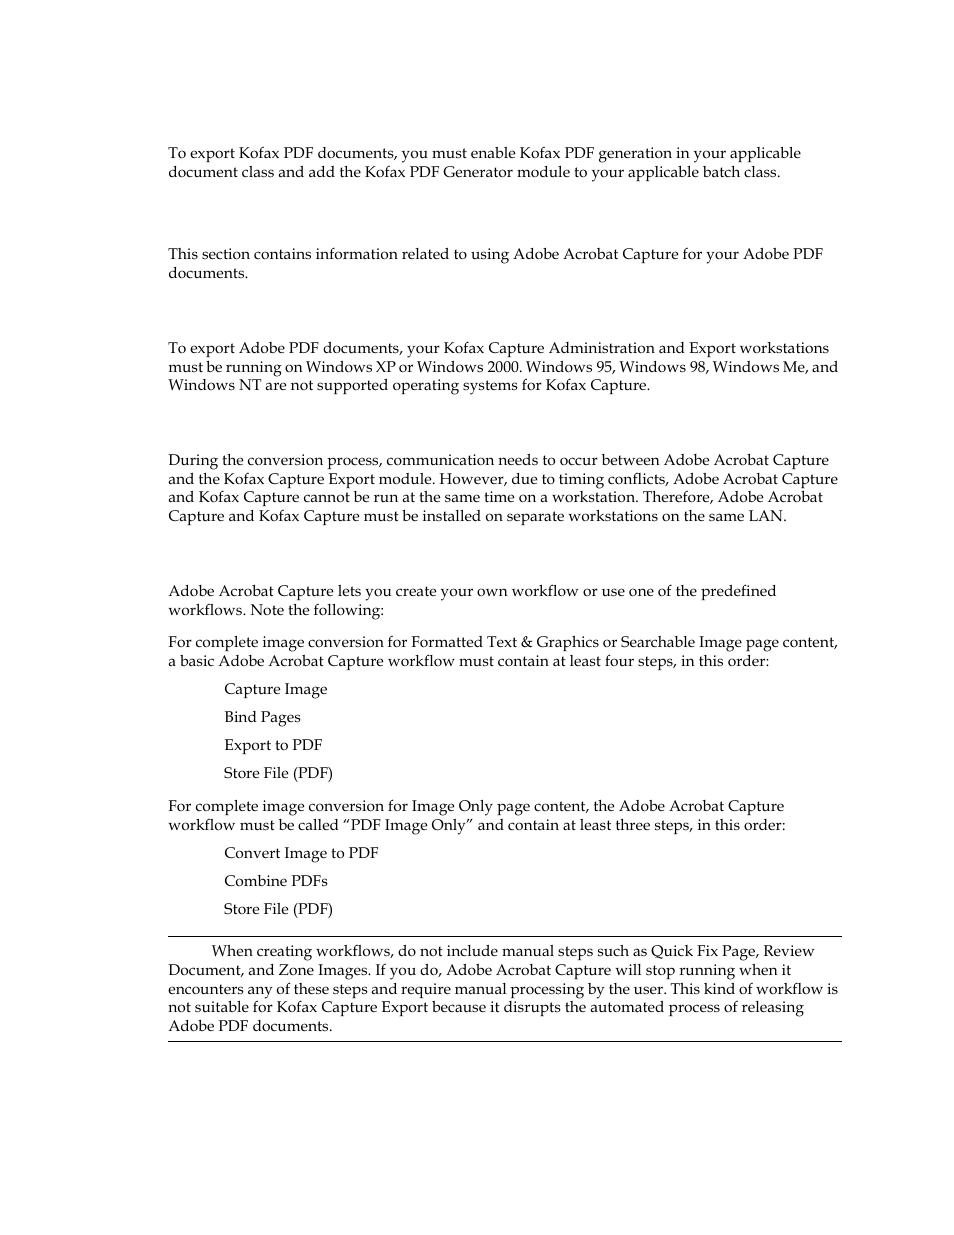 Kofax pdf options, Adobe acrobat capture options, Operating